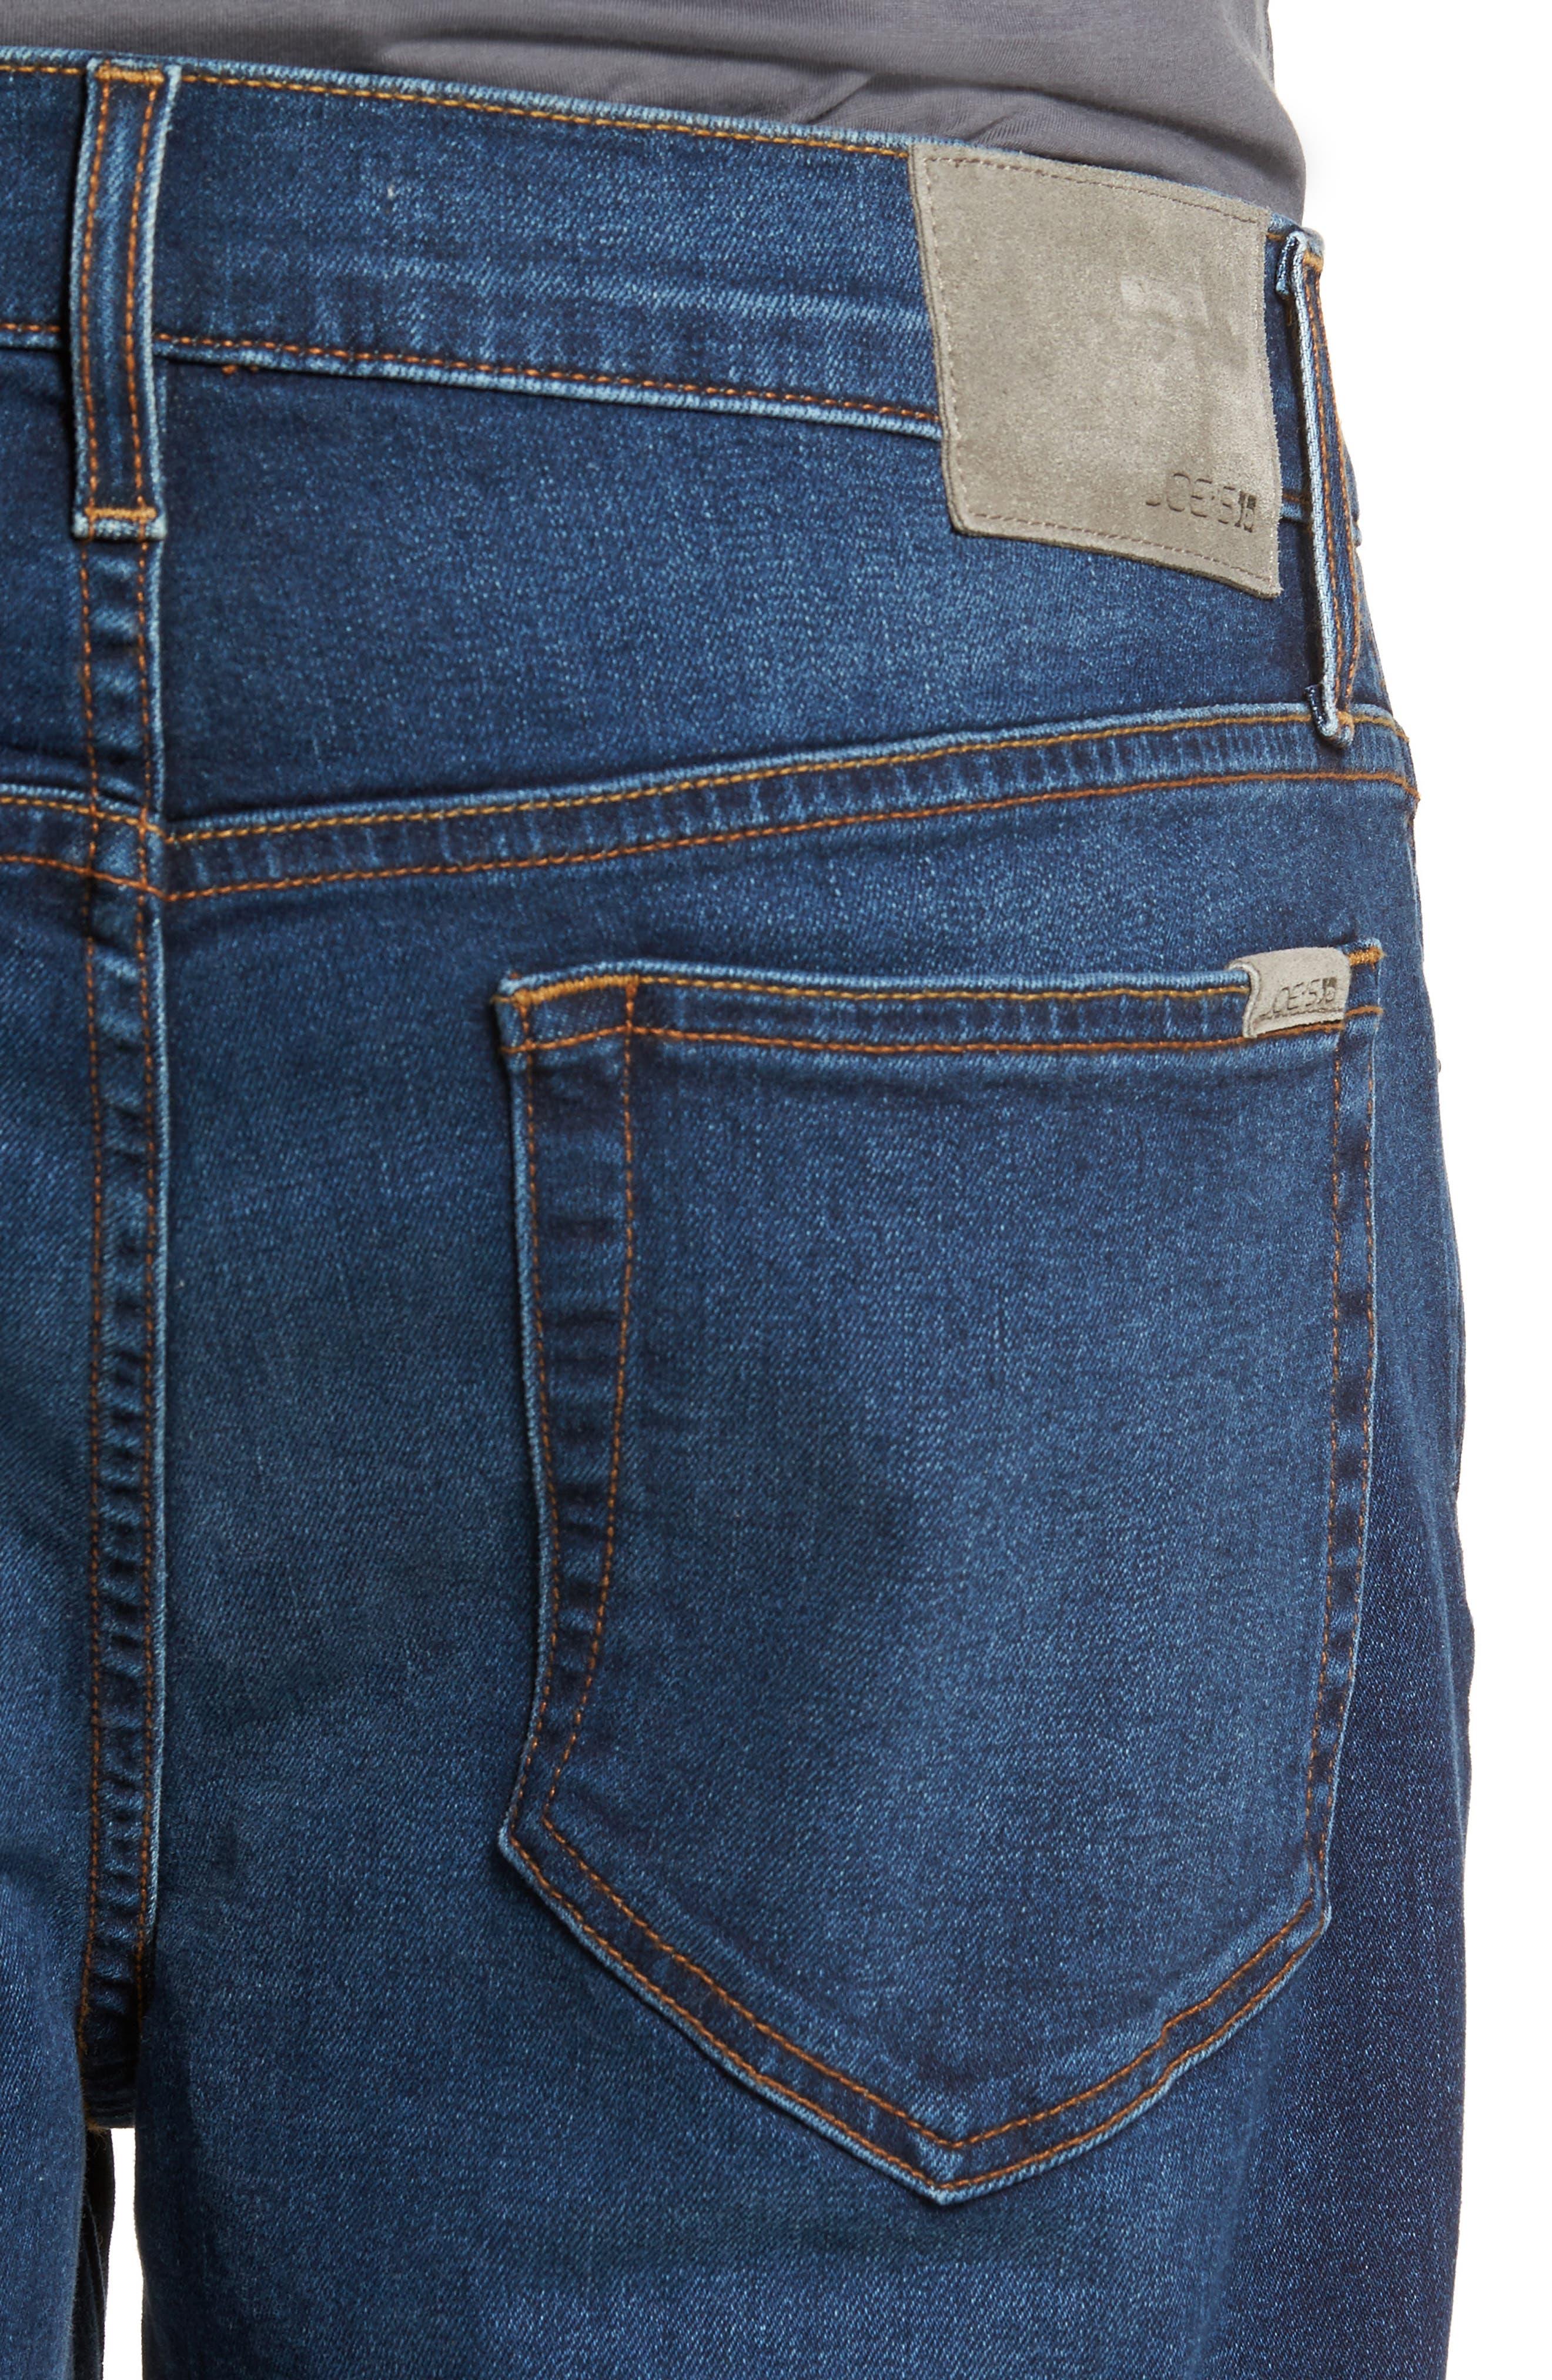 Brixton Slim Straight Leg Jeans,                             Alternate thumbnail 4, color,                             Line